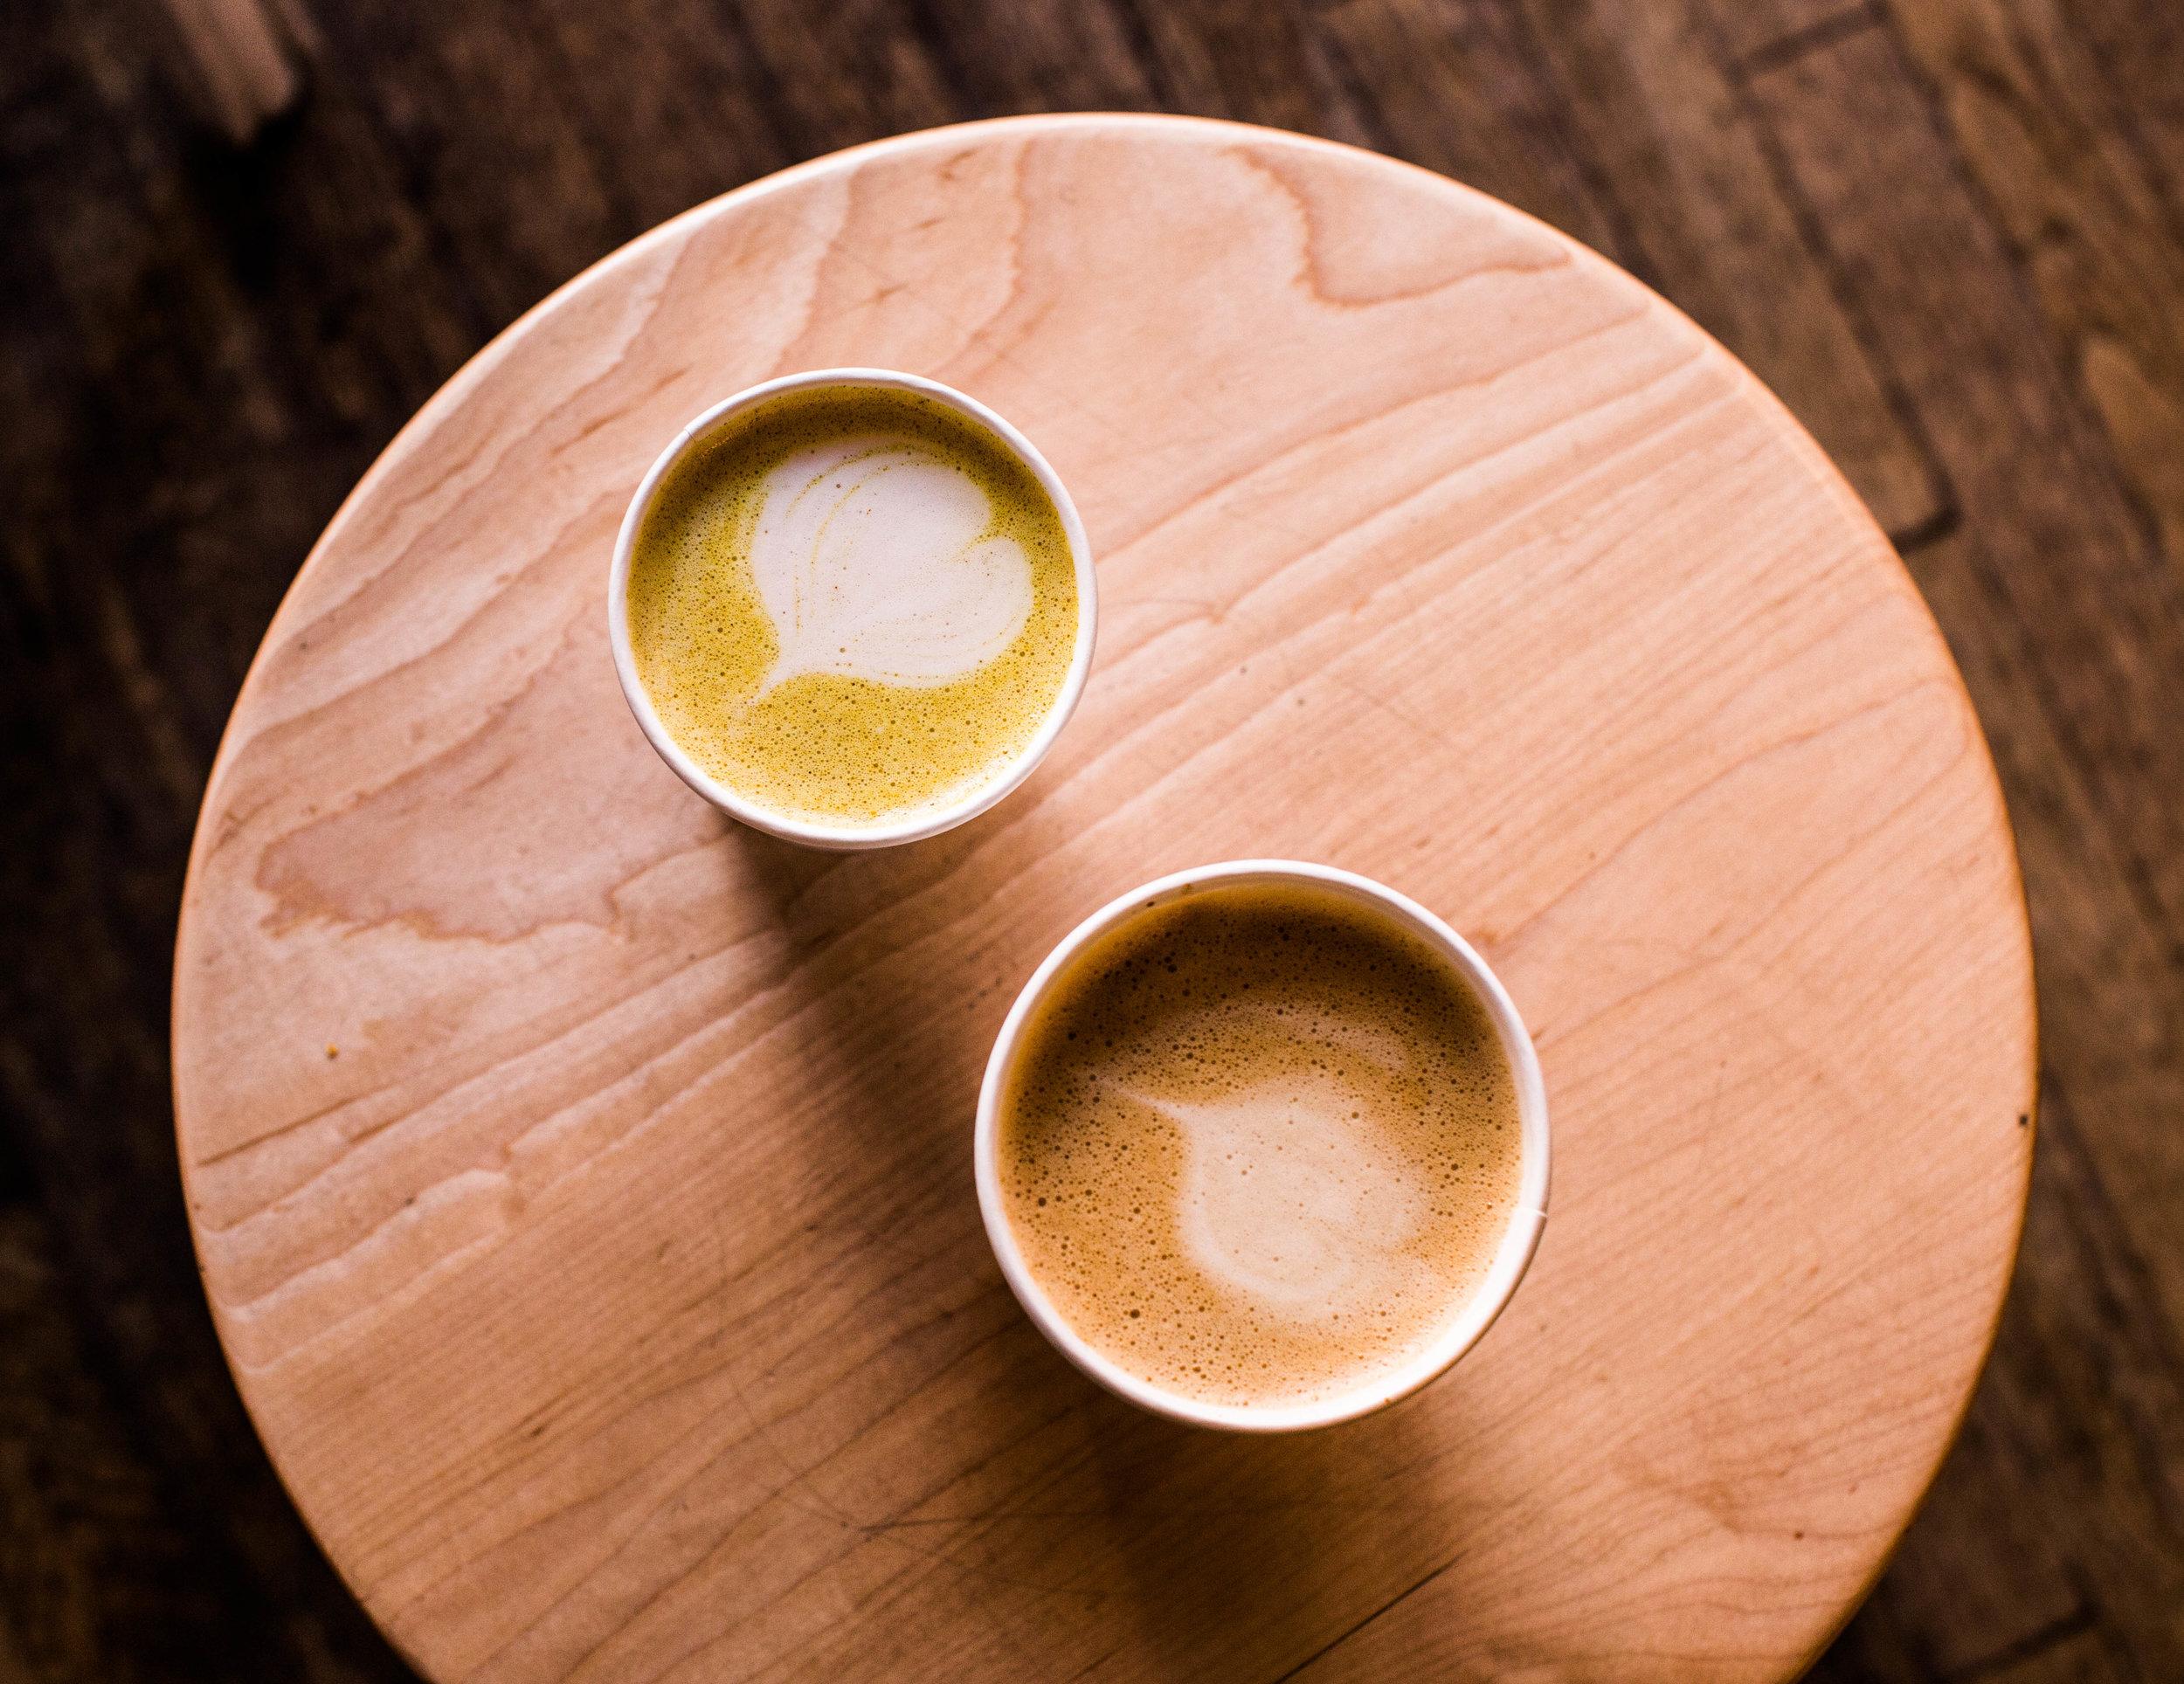 Golden Milk - A Warming Anti-Inflammatory Ayurvedic Drink